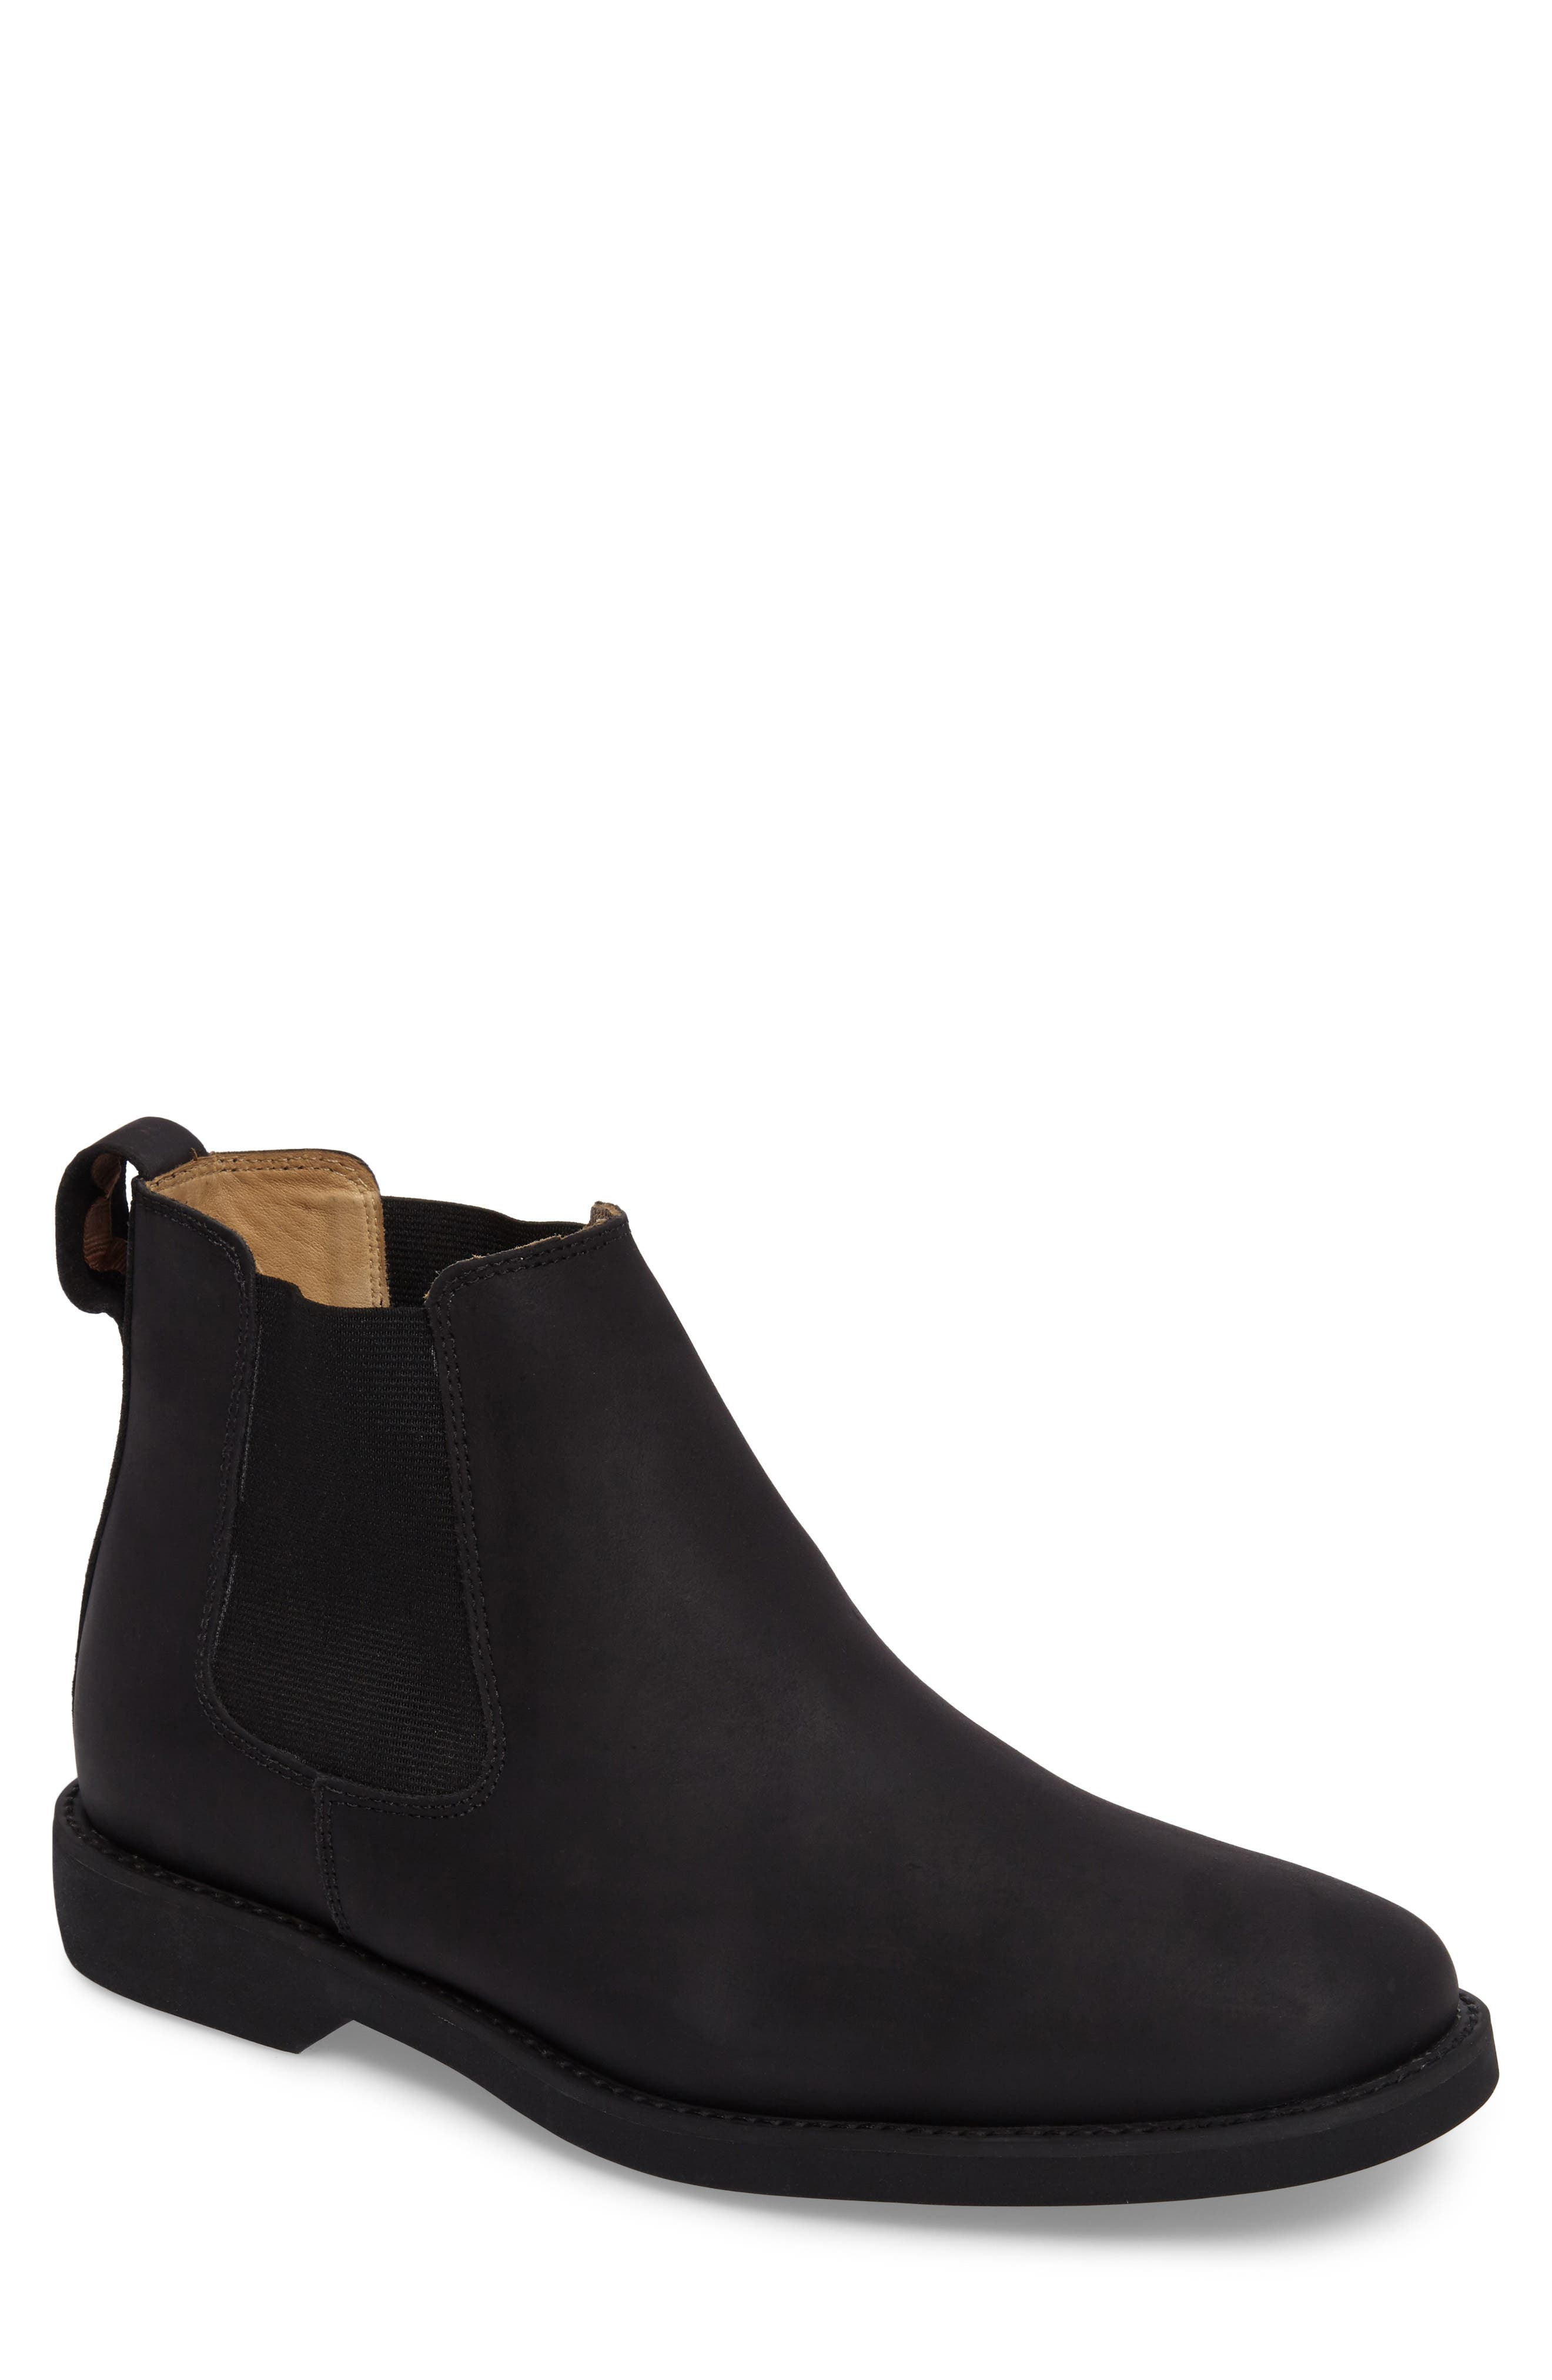 Cardoso Chelsea Boot,                         Main,                         color, MUSTANG BLACK